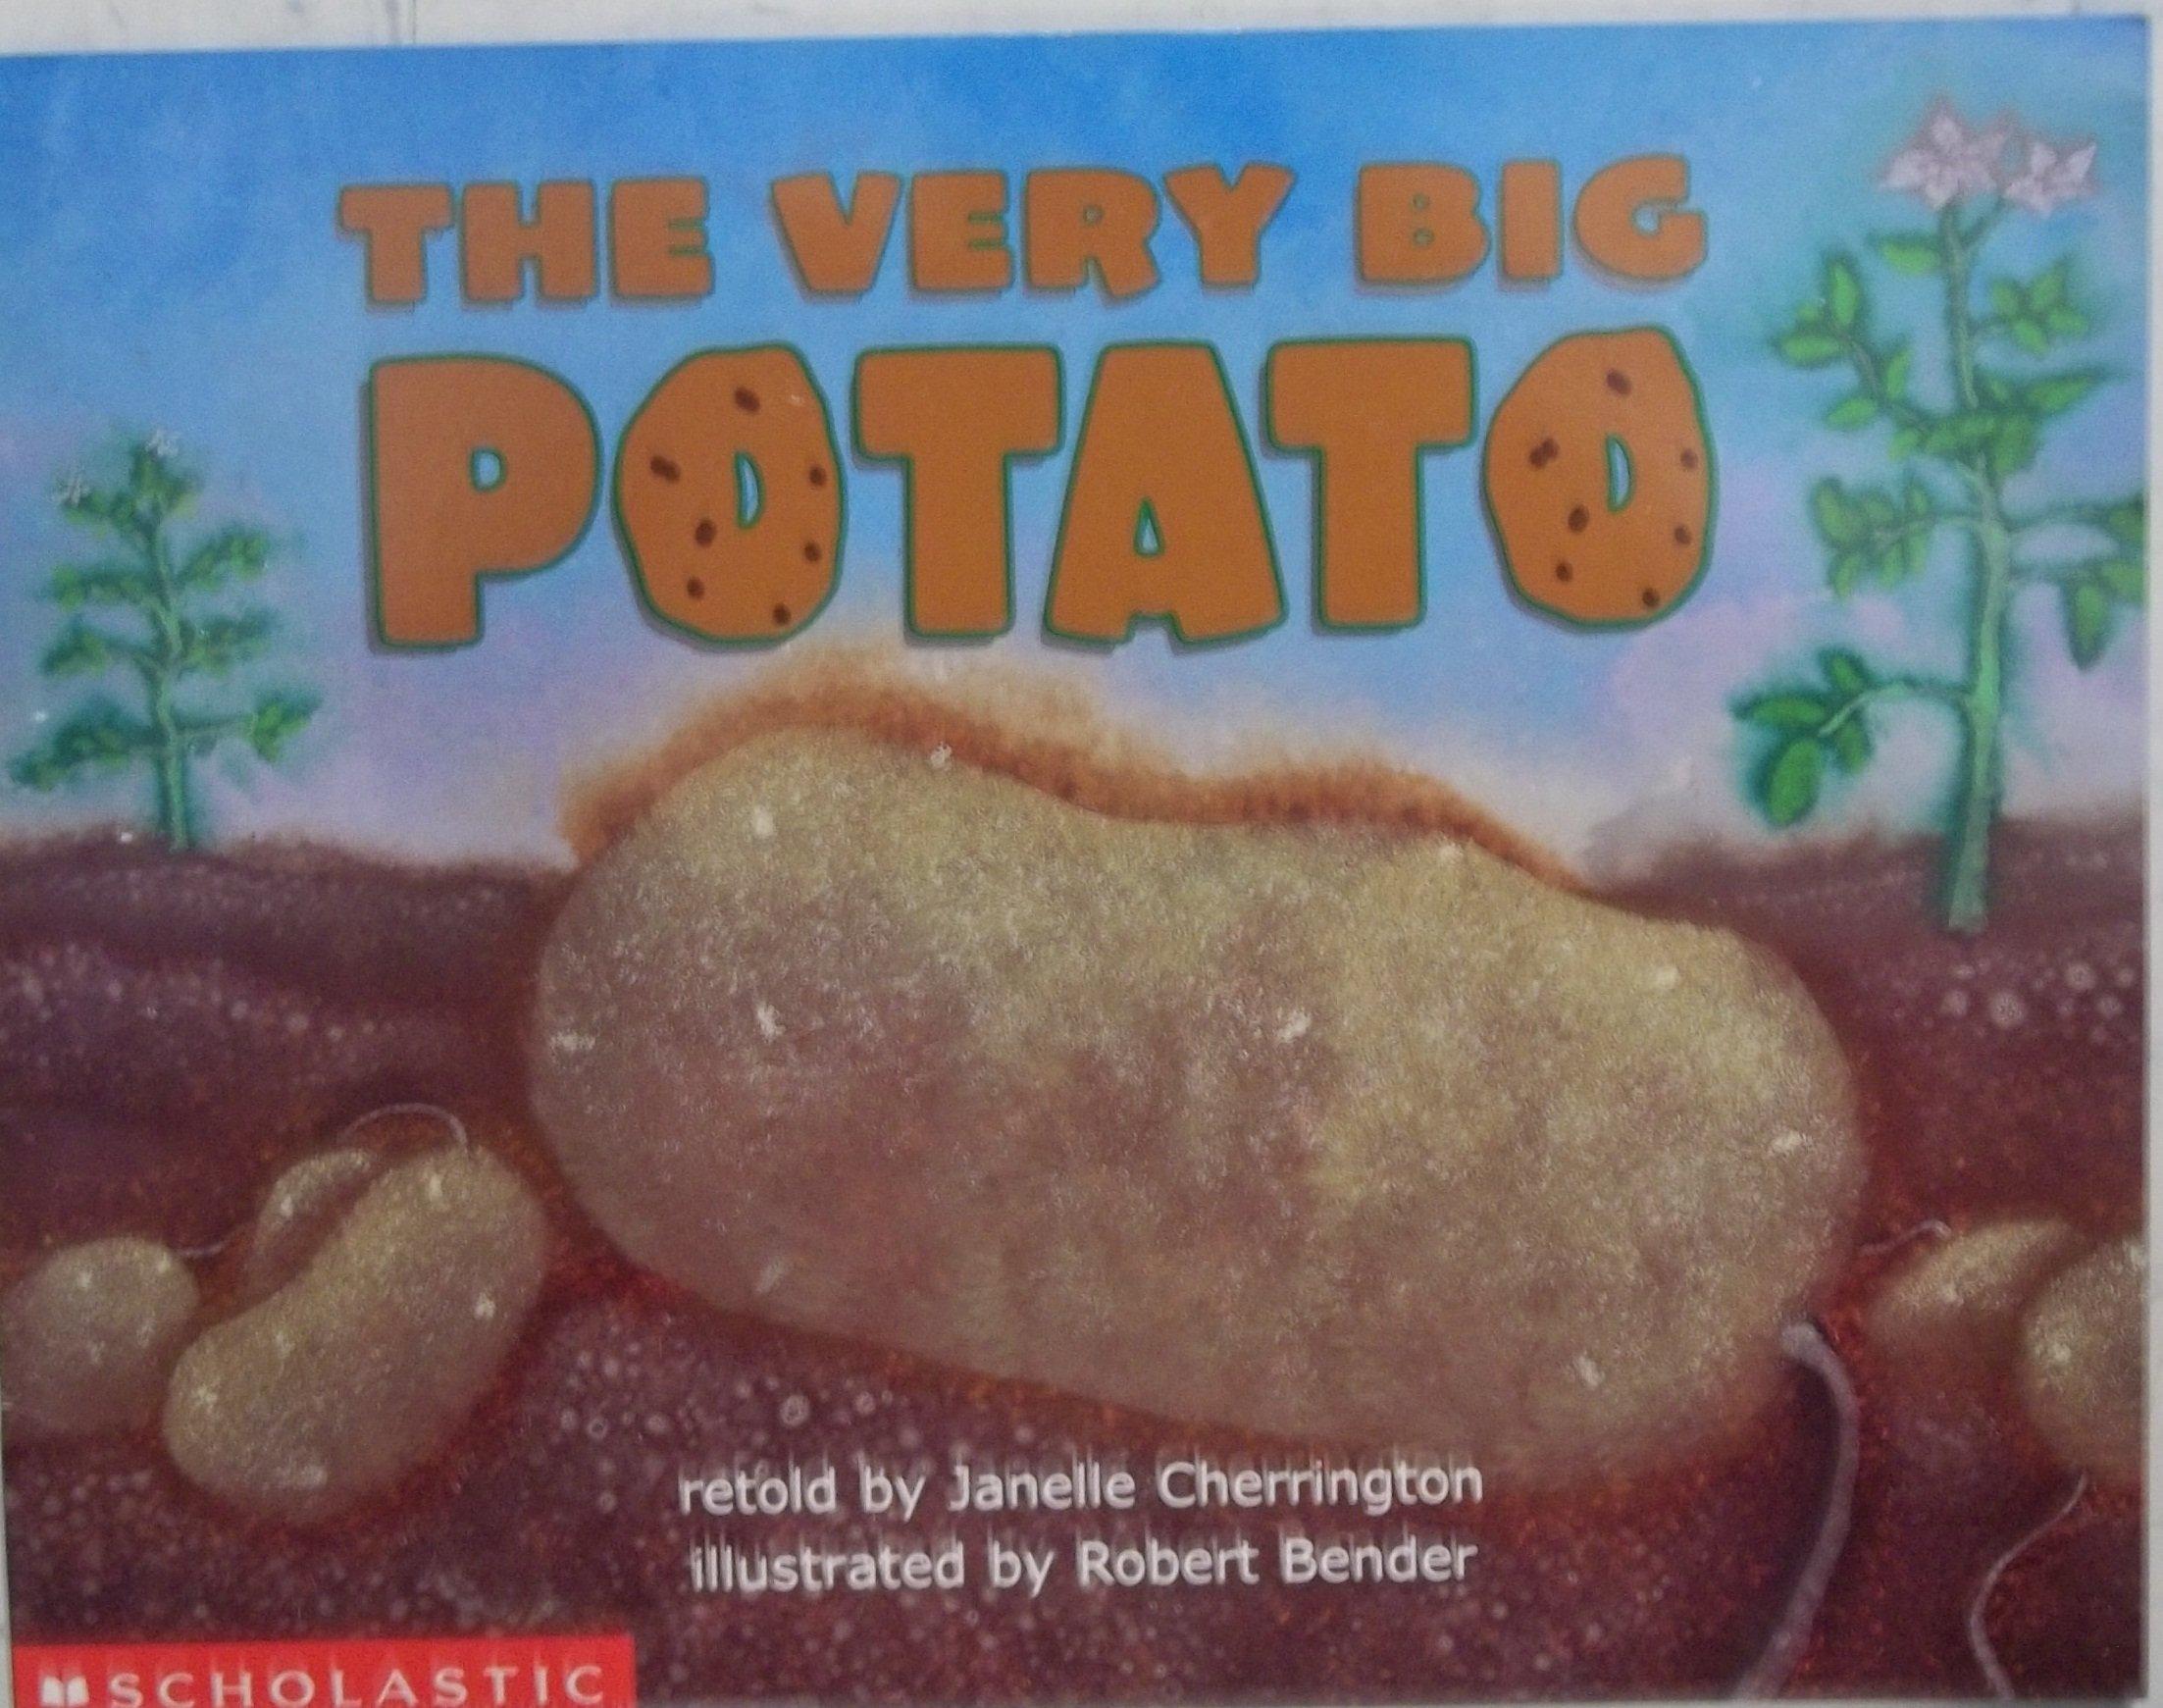 The very big potato ebook